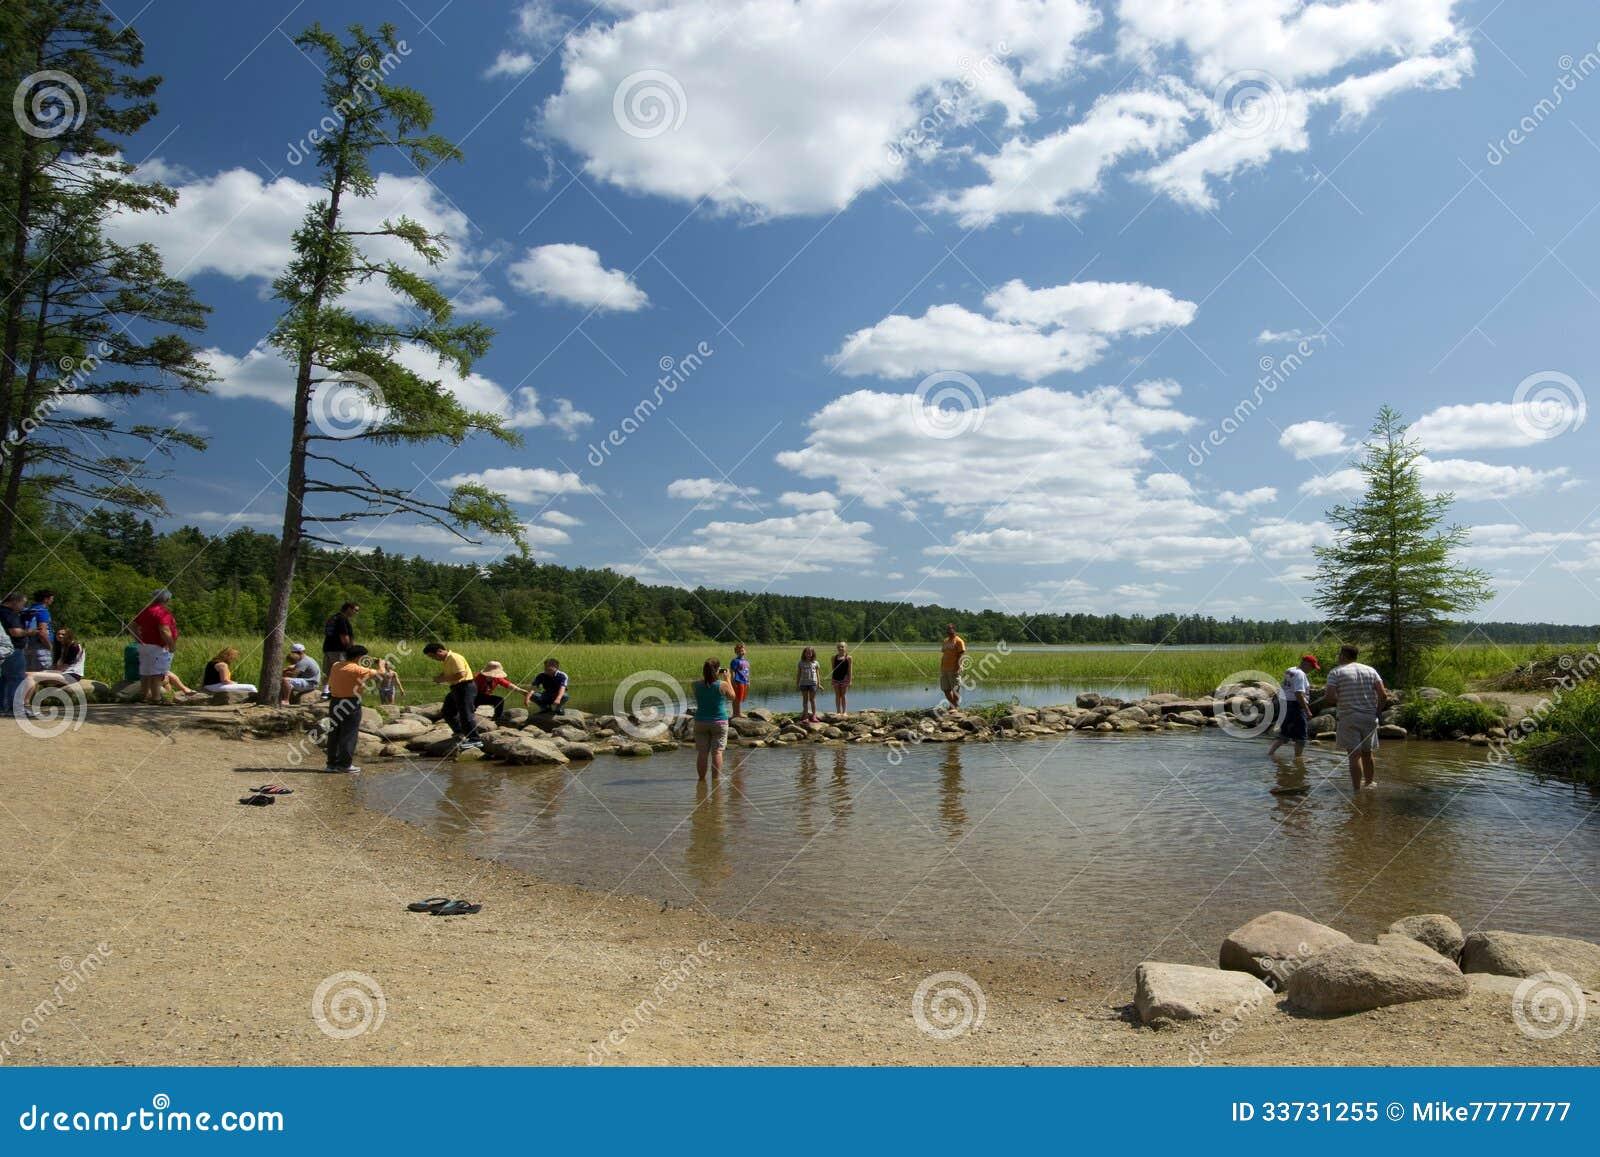 Озеро Itasca и источник реки Миссисипи